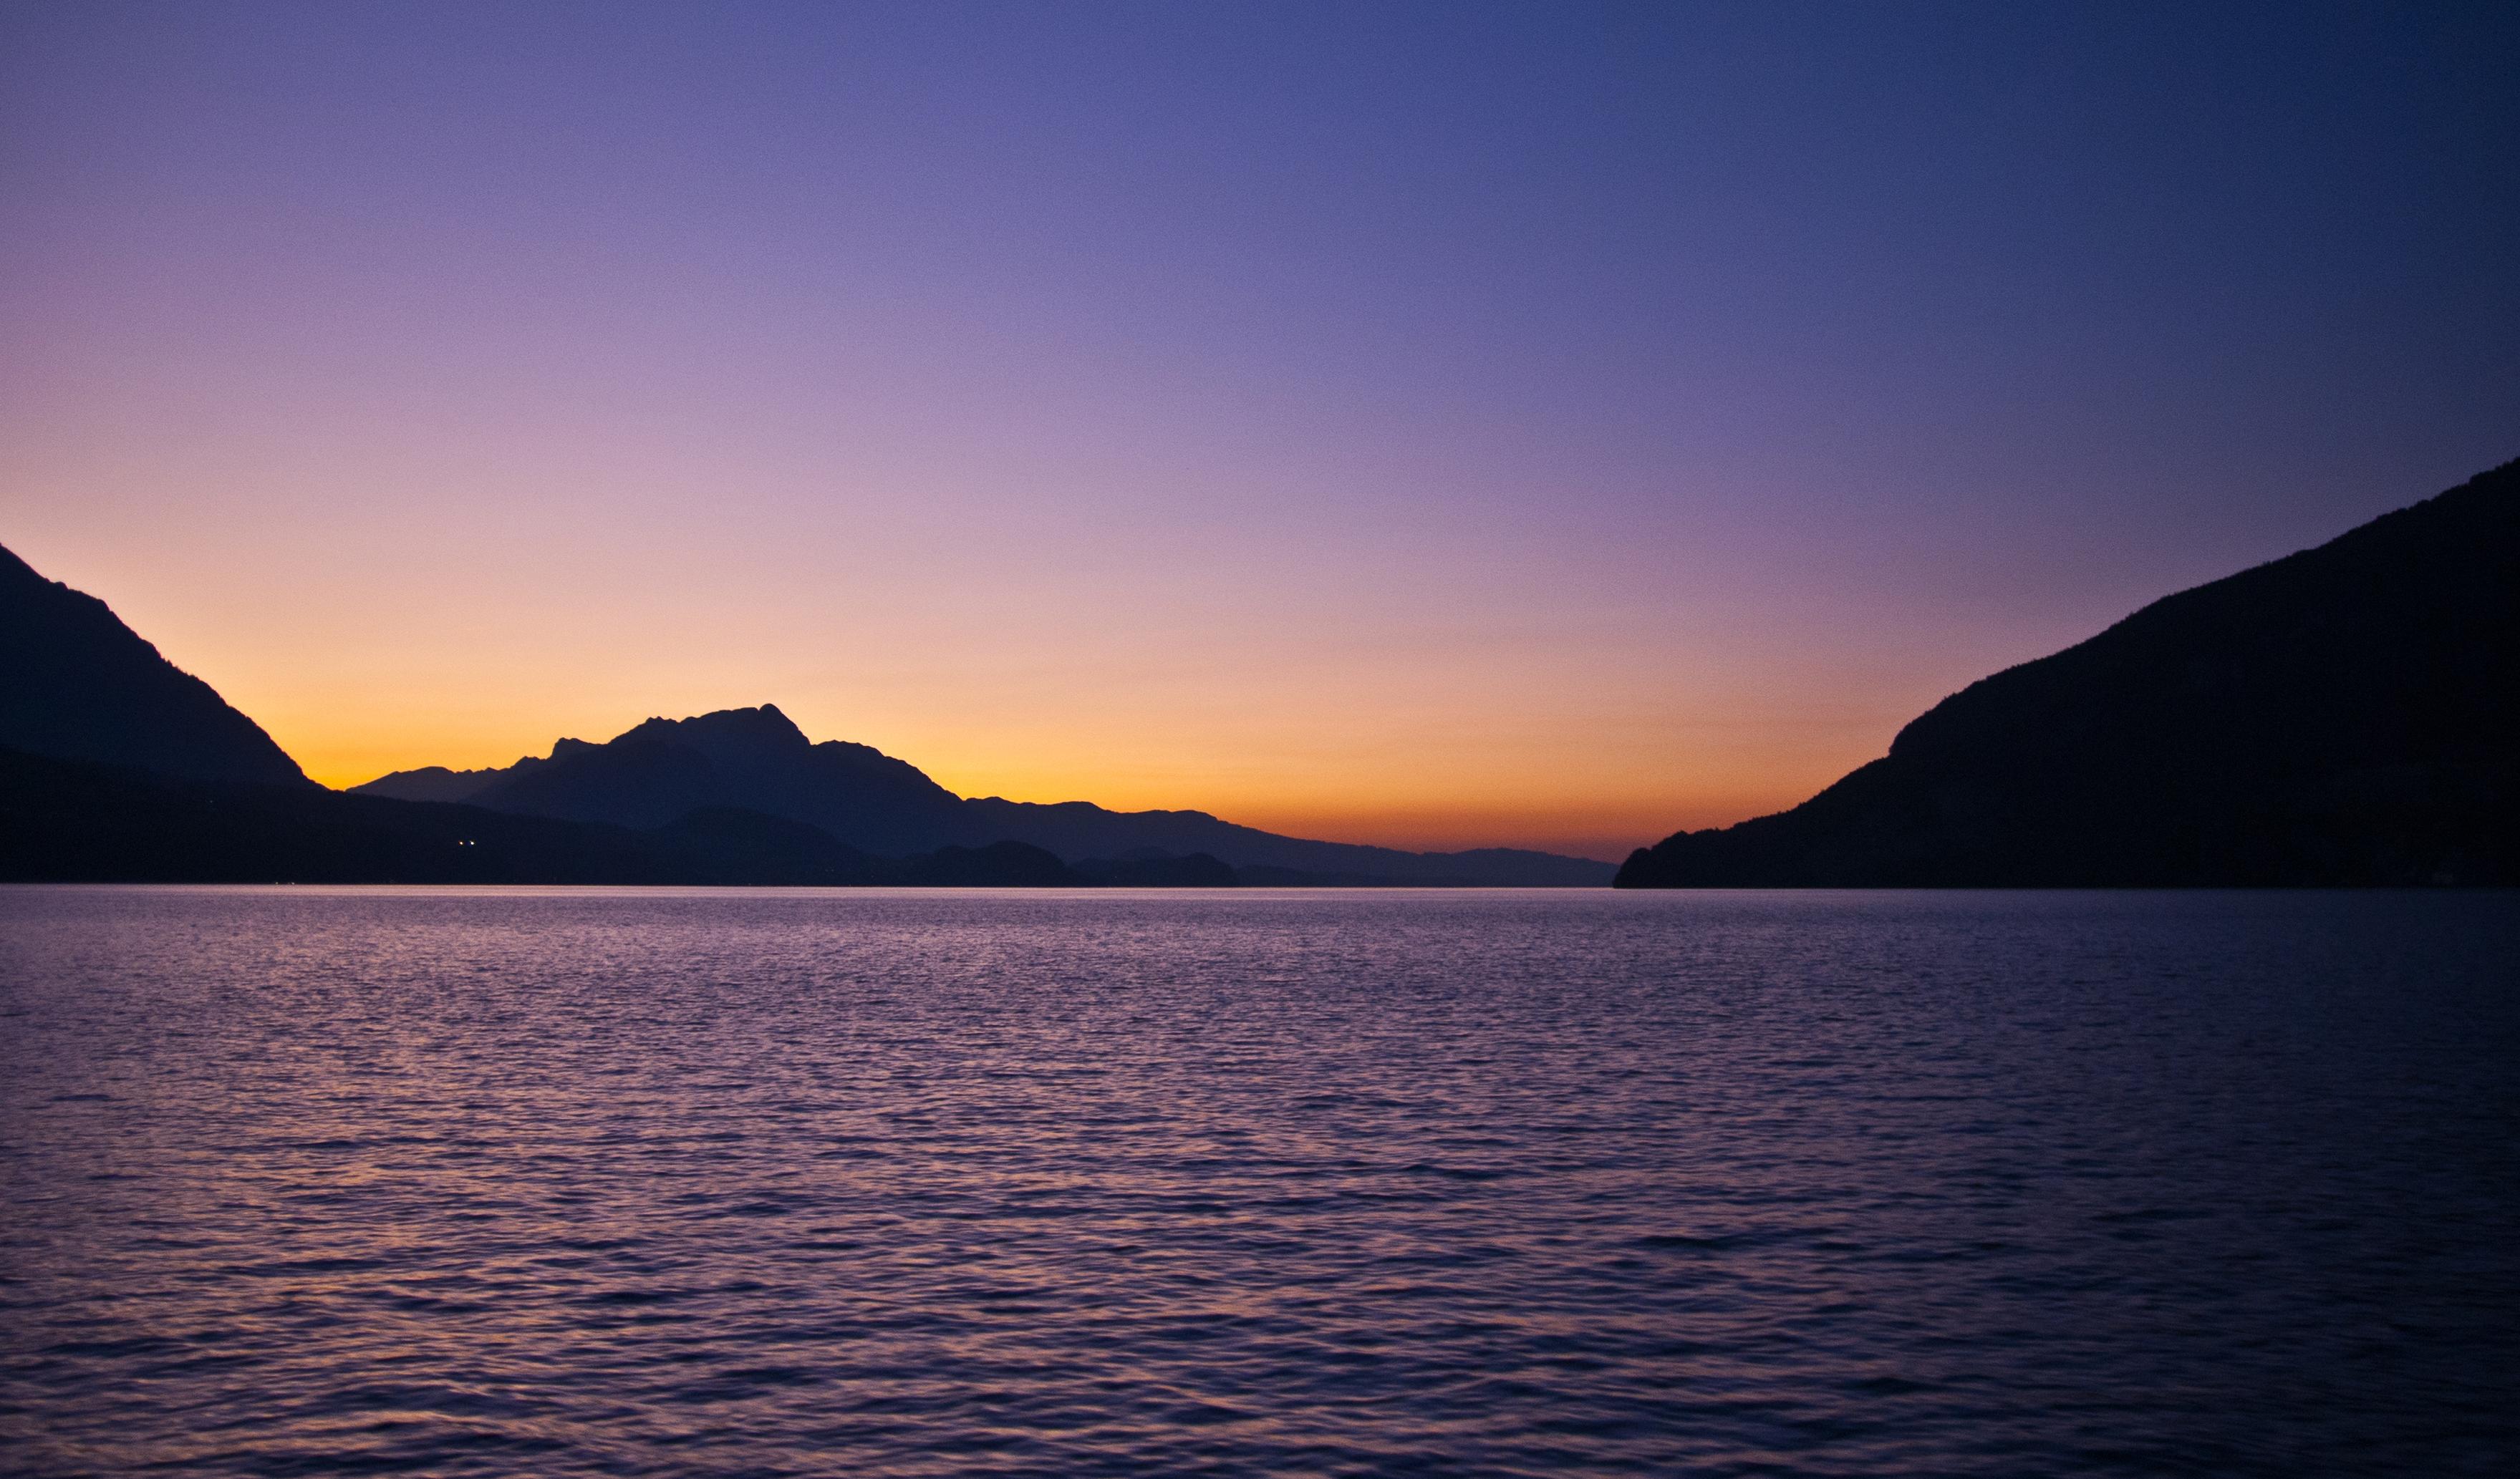 Colorful Sunset by DuarteFotografiach